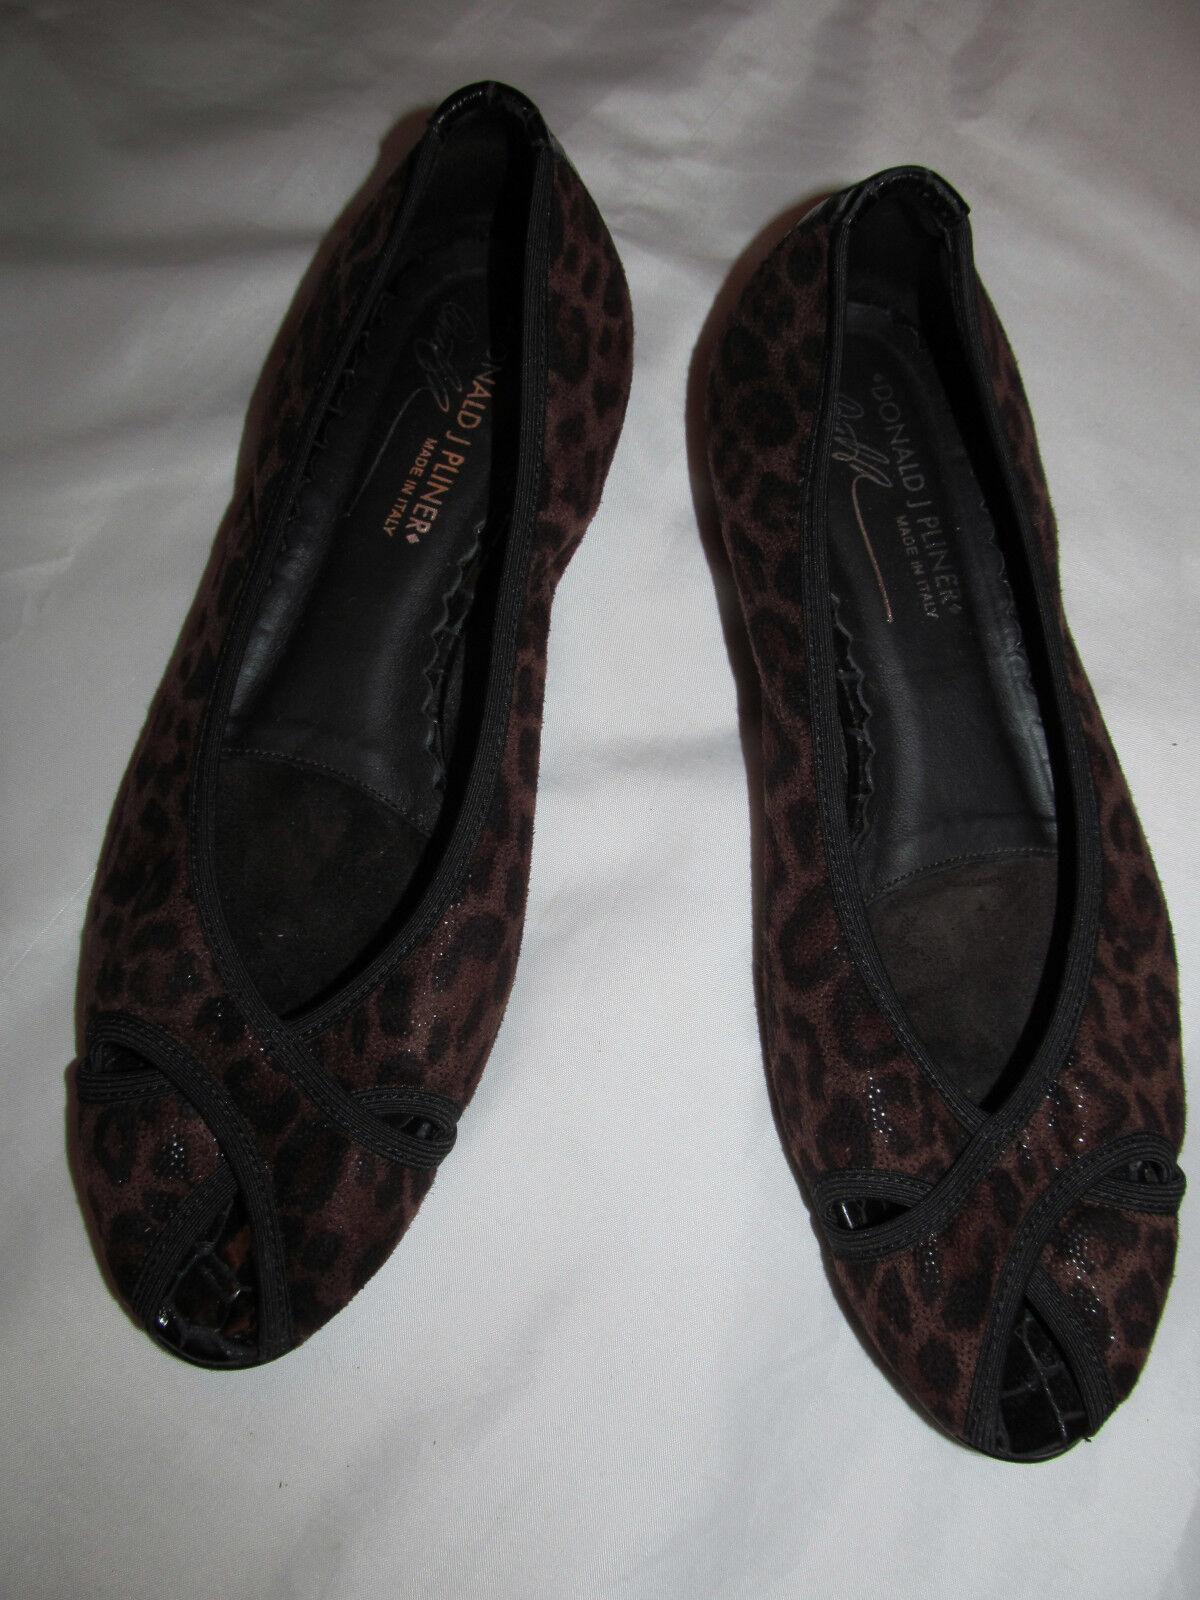 DONALD J PLINER GLORIA leopard  shimmer suede like fabric peep toe flats shoes